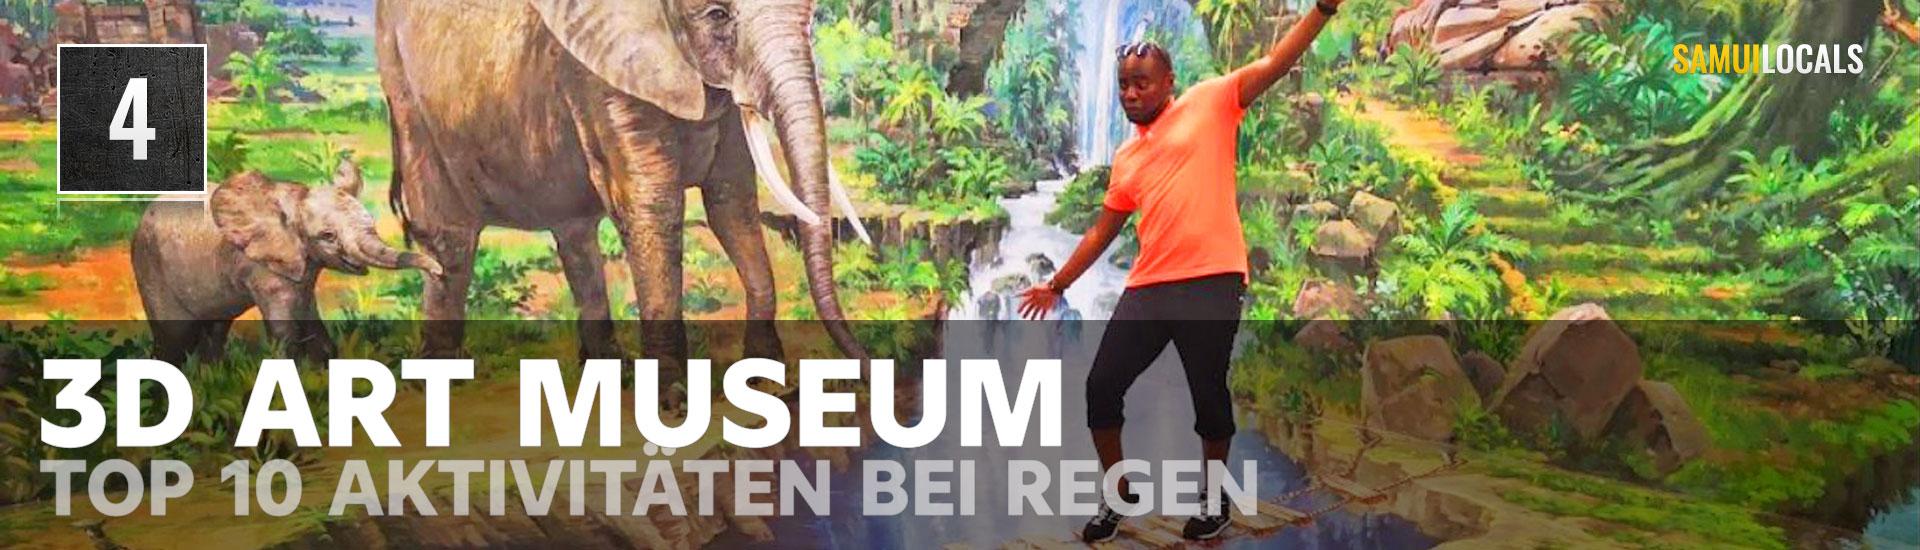 top_10_aktivitaeten_bei_regen_3d_art_museum